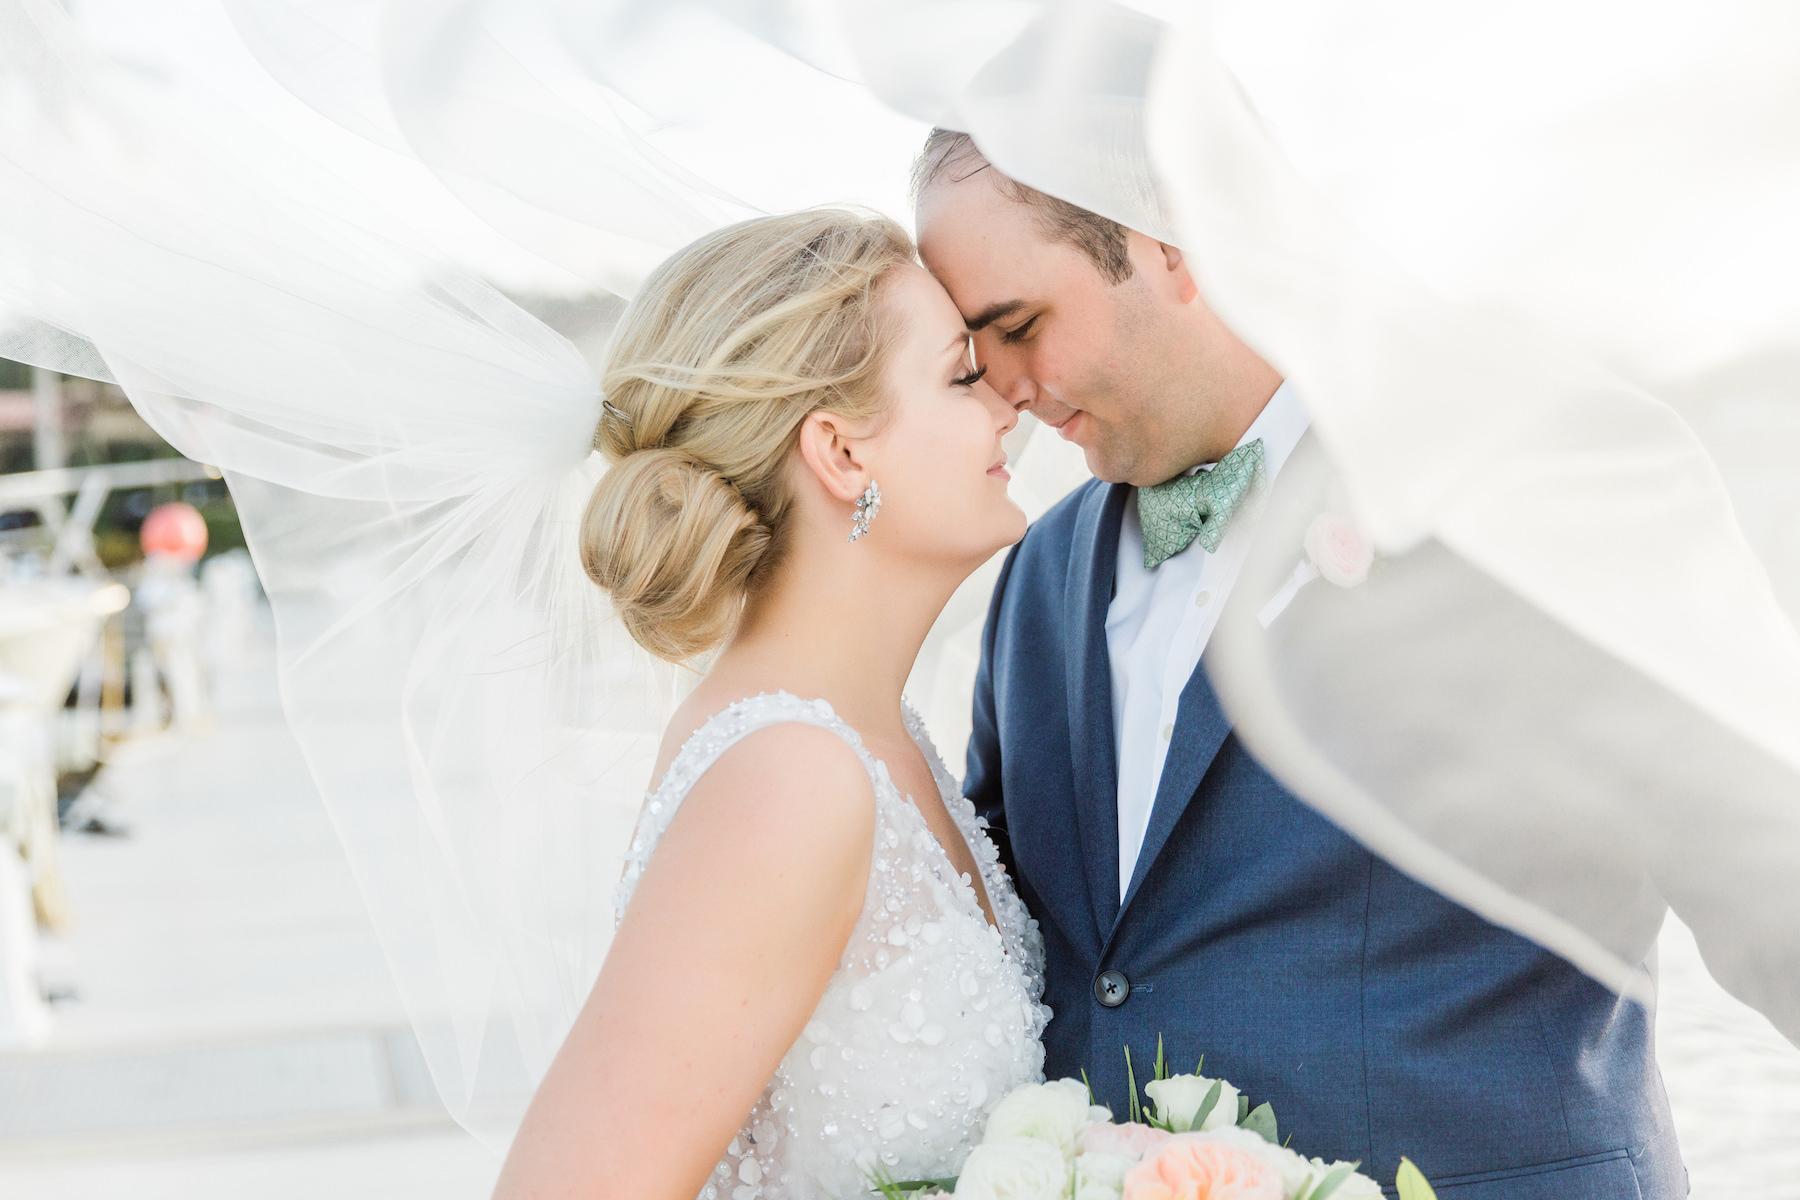 Destination Florida Bride and Groom Wedding Portrait with Flying Veil